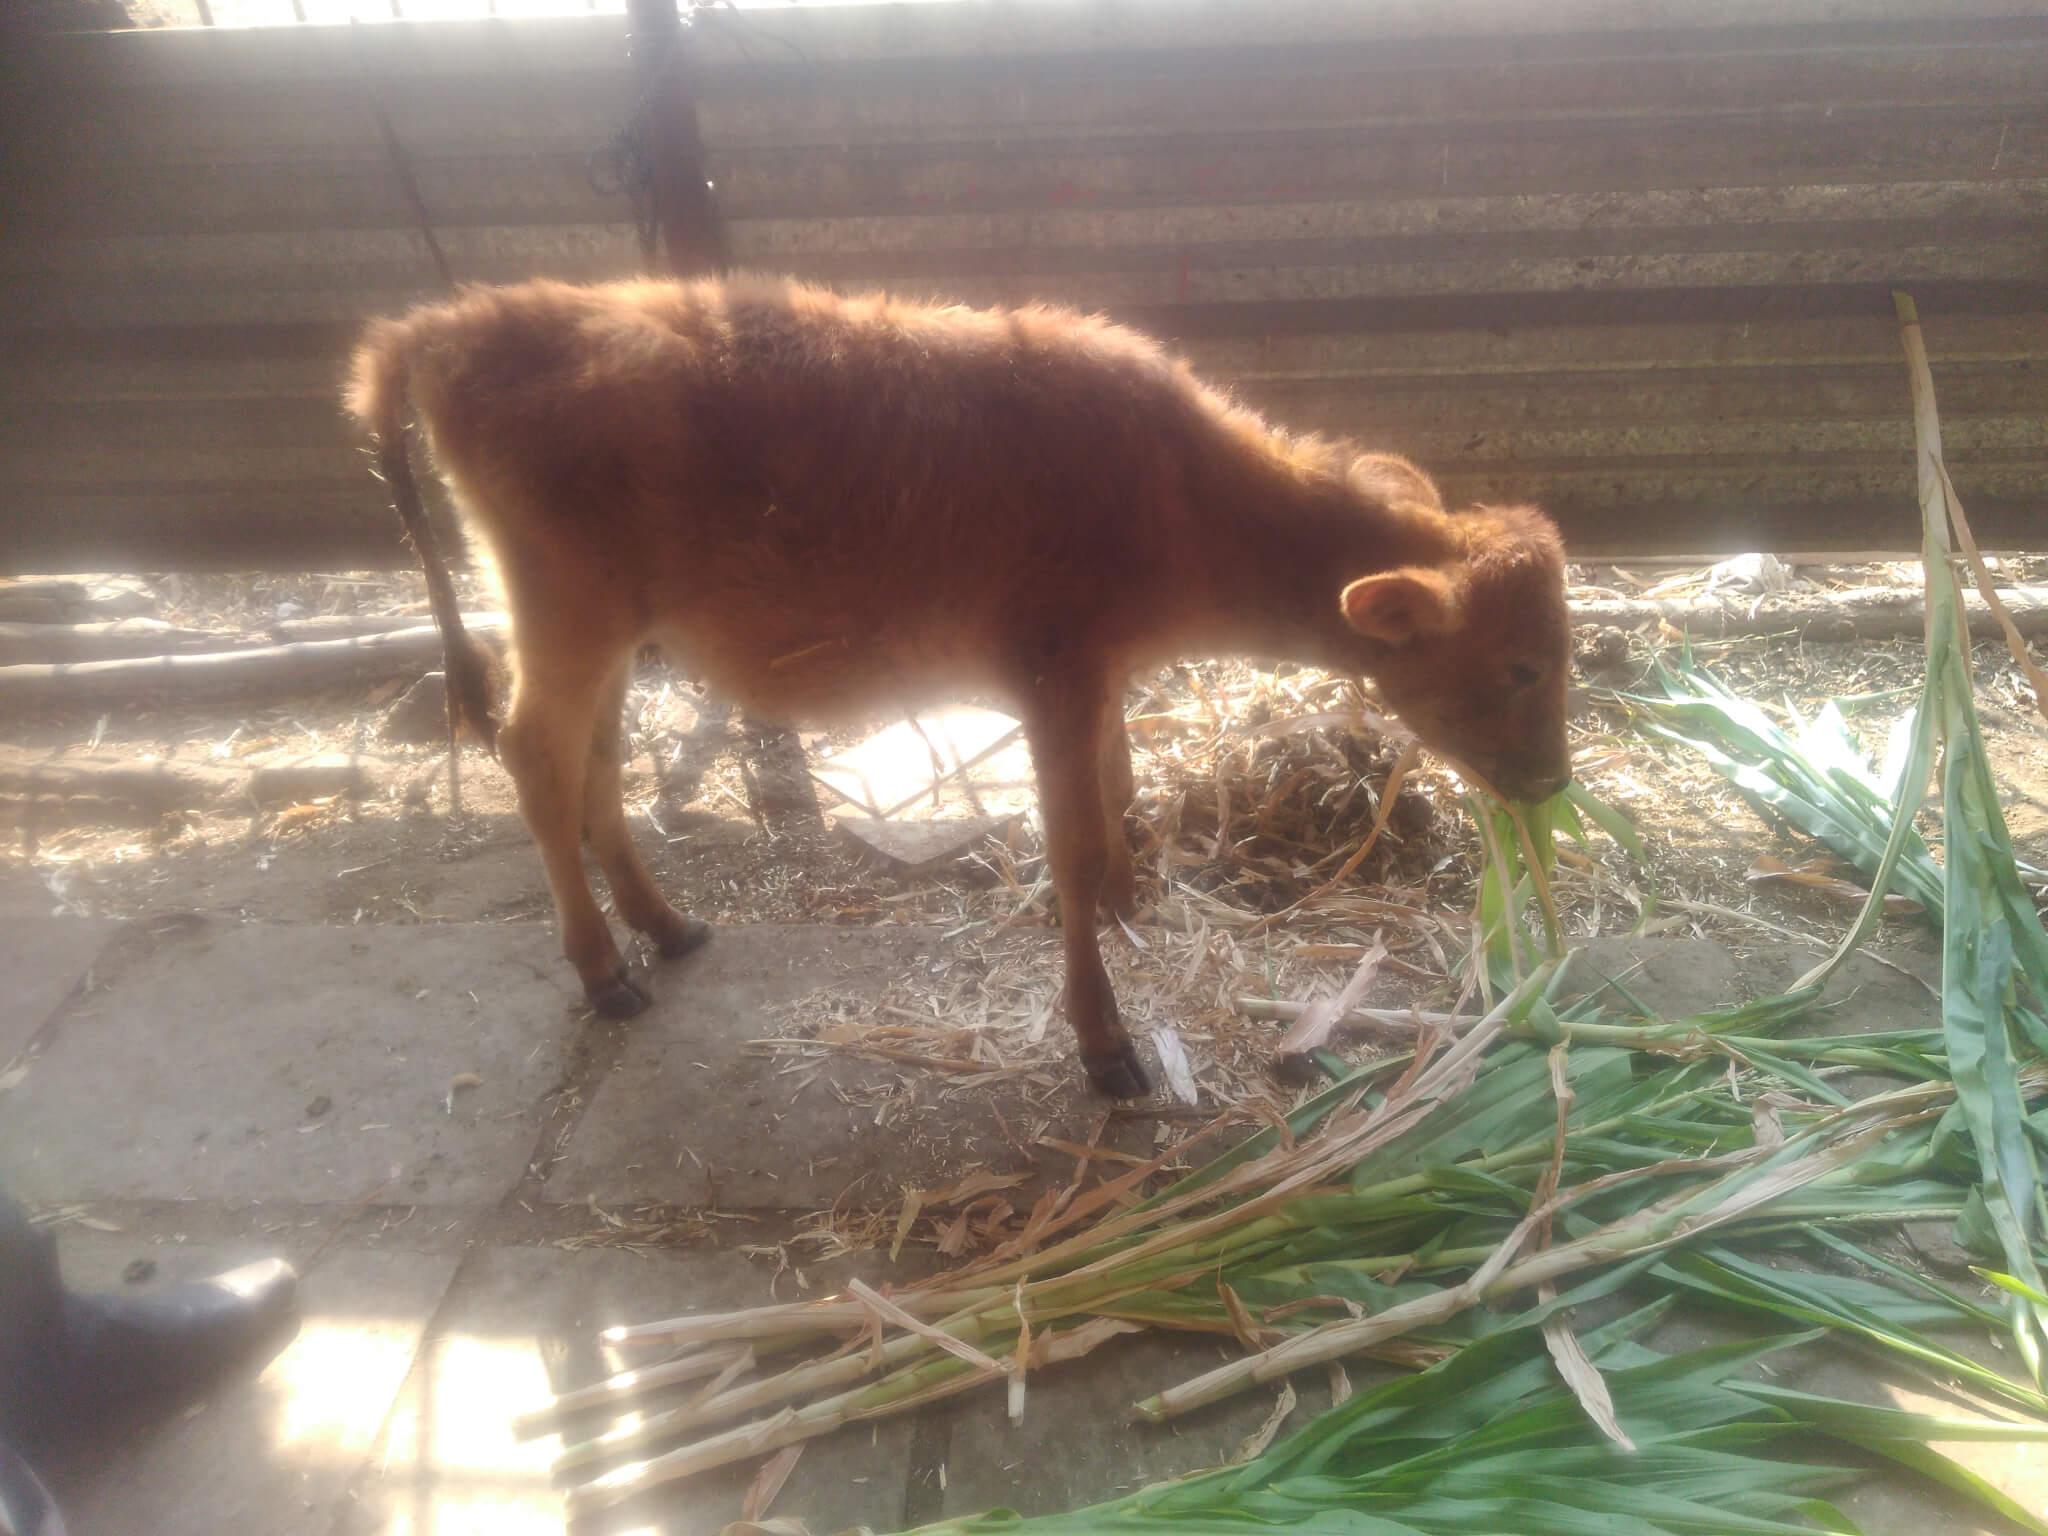 Shelia the calf at the sanctuary